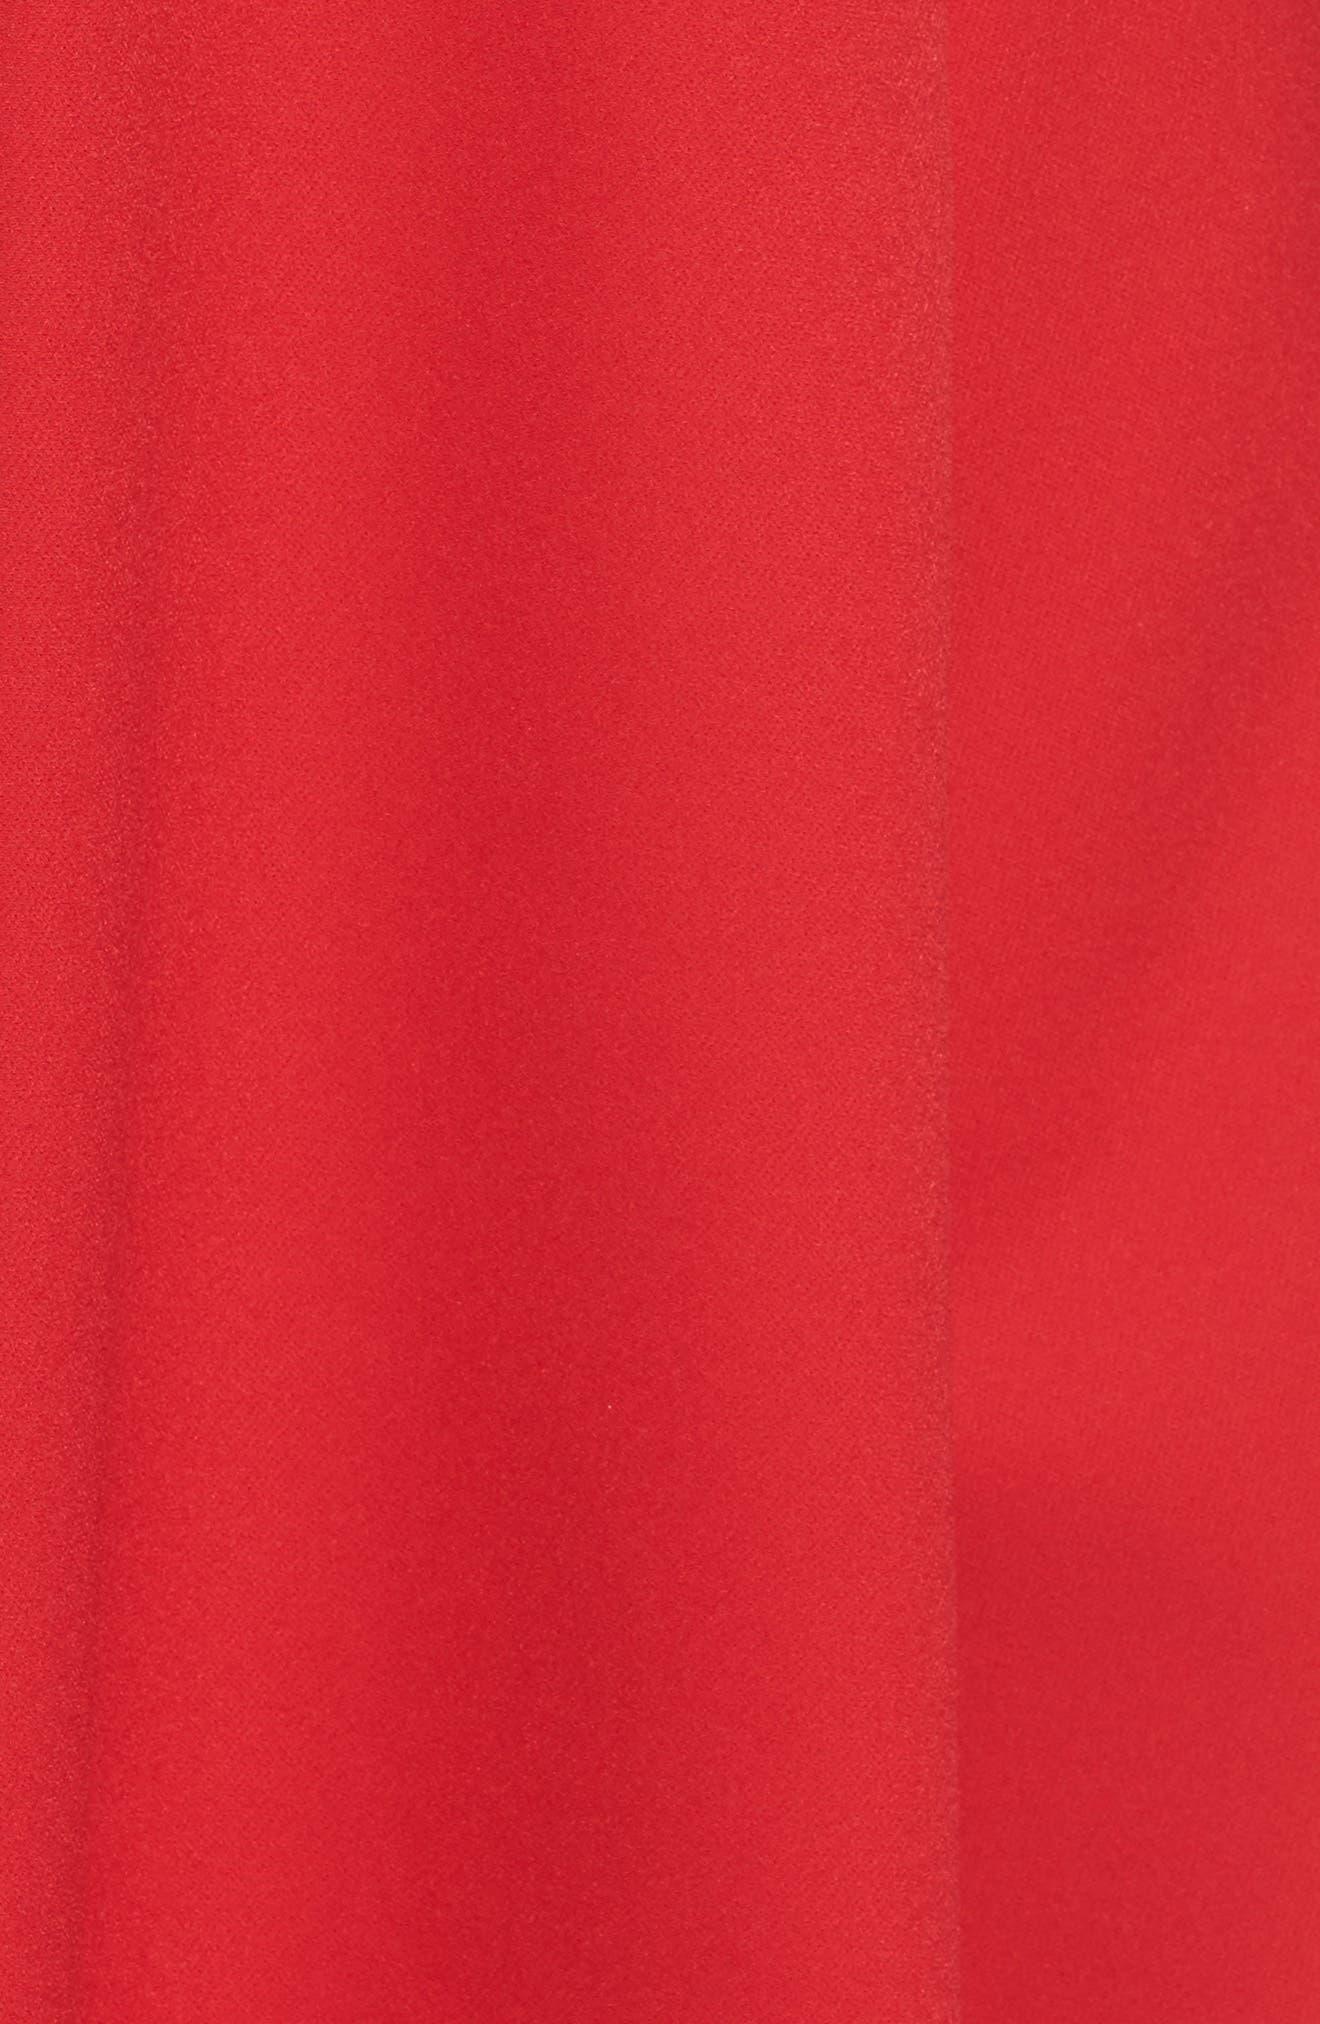 Pearl Cold Shoulder Fit & Flare Dress,                             Alternate thumbnail 5, color,                             600